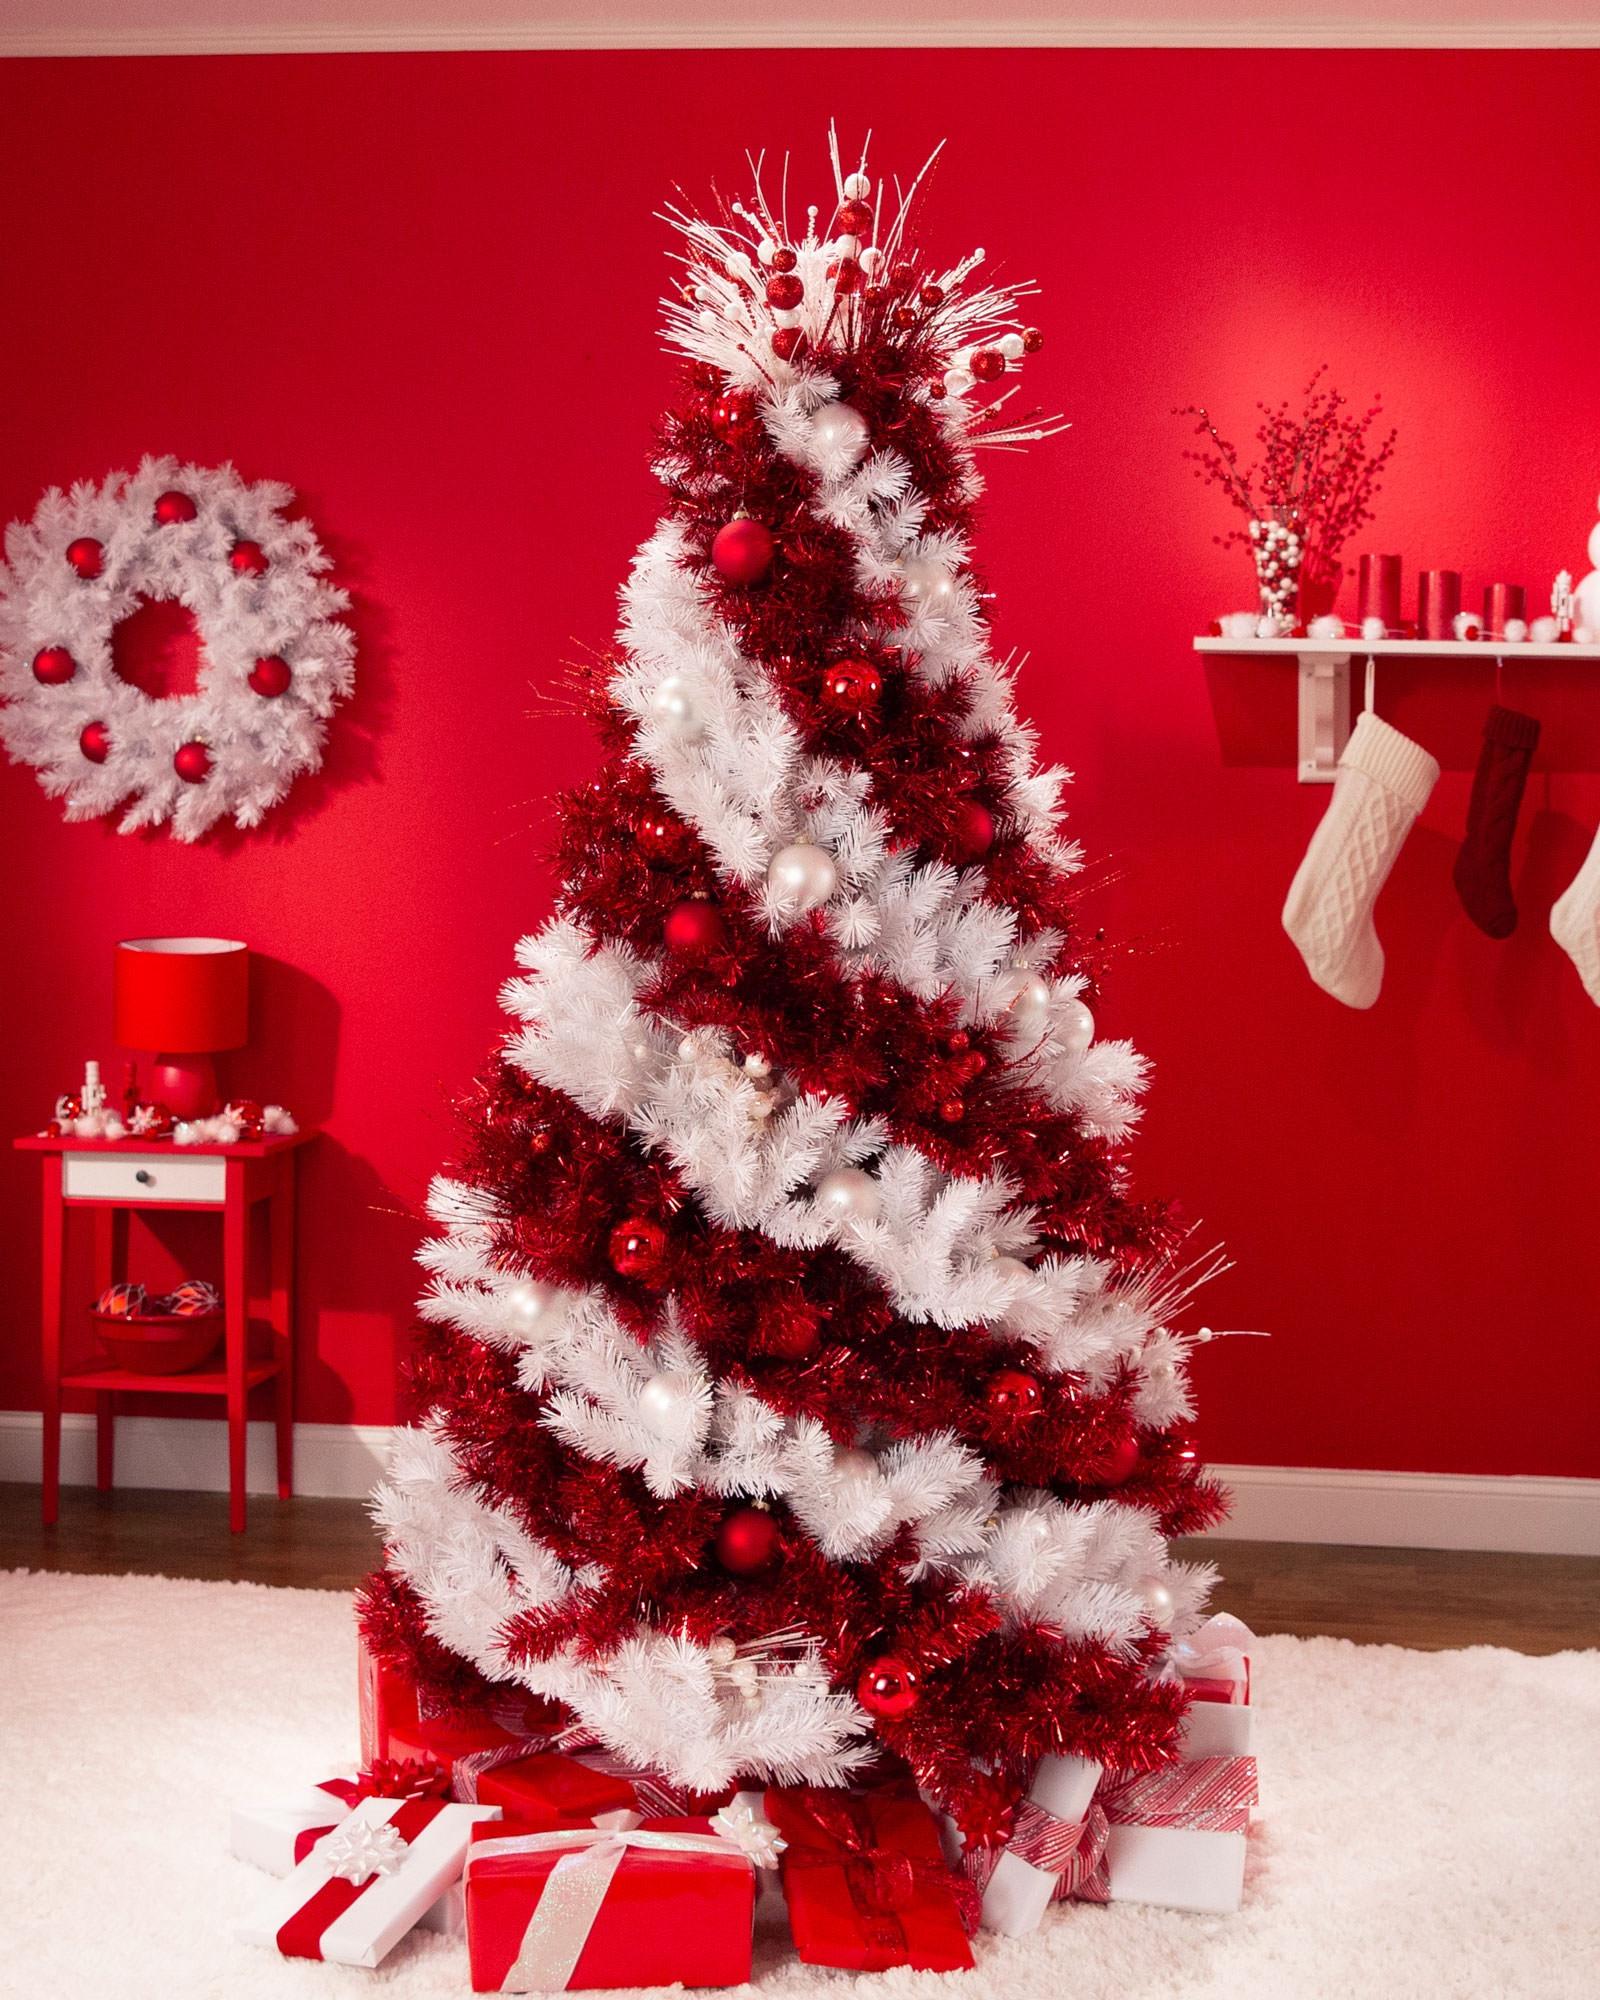 Candy Cane Christmas  Candy Cane Christmas Trees line